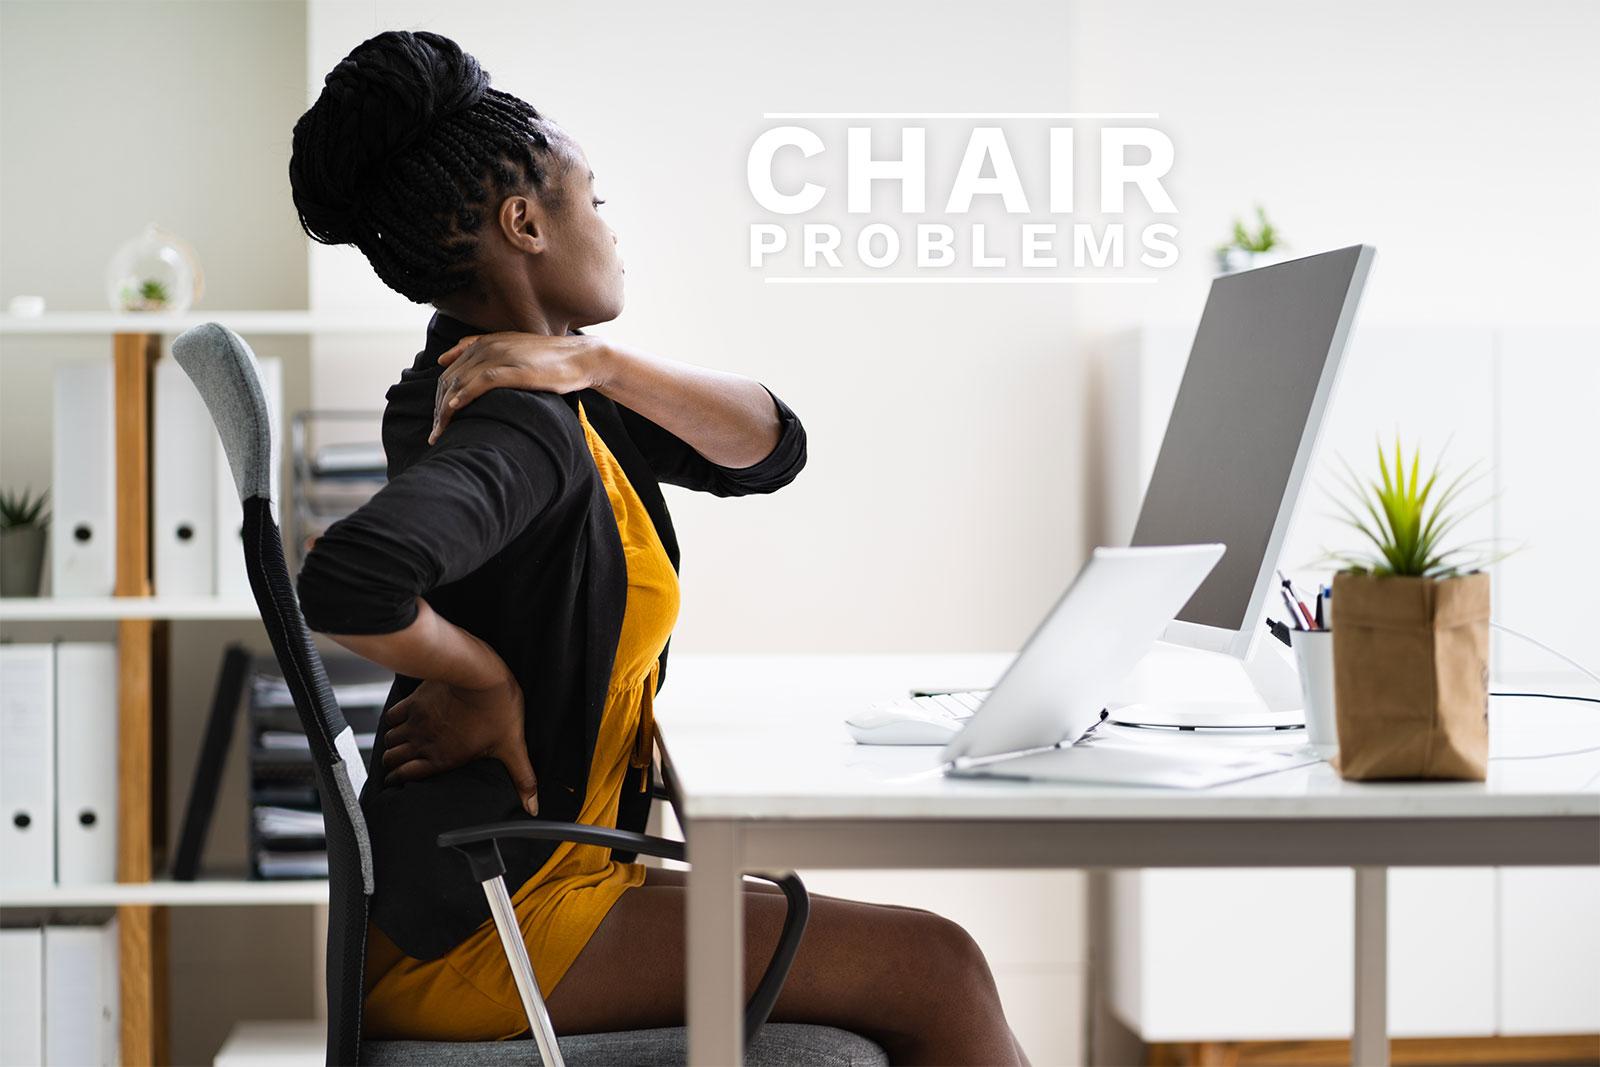 Chair Problems